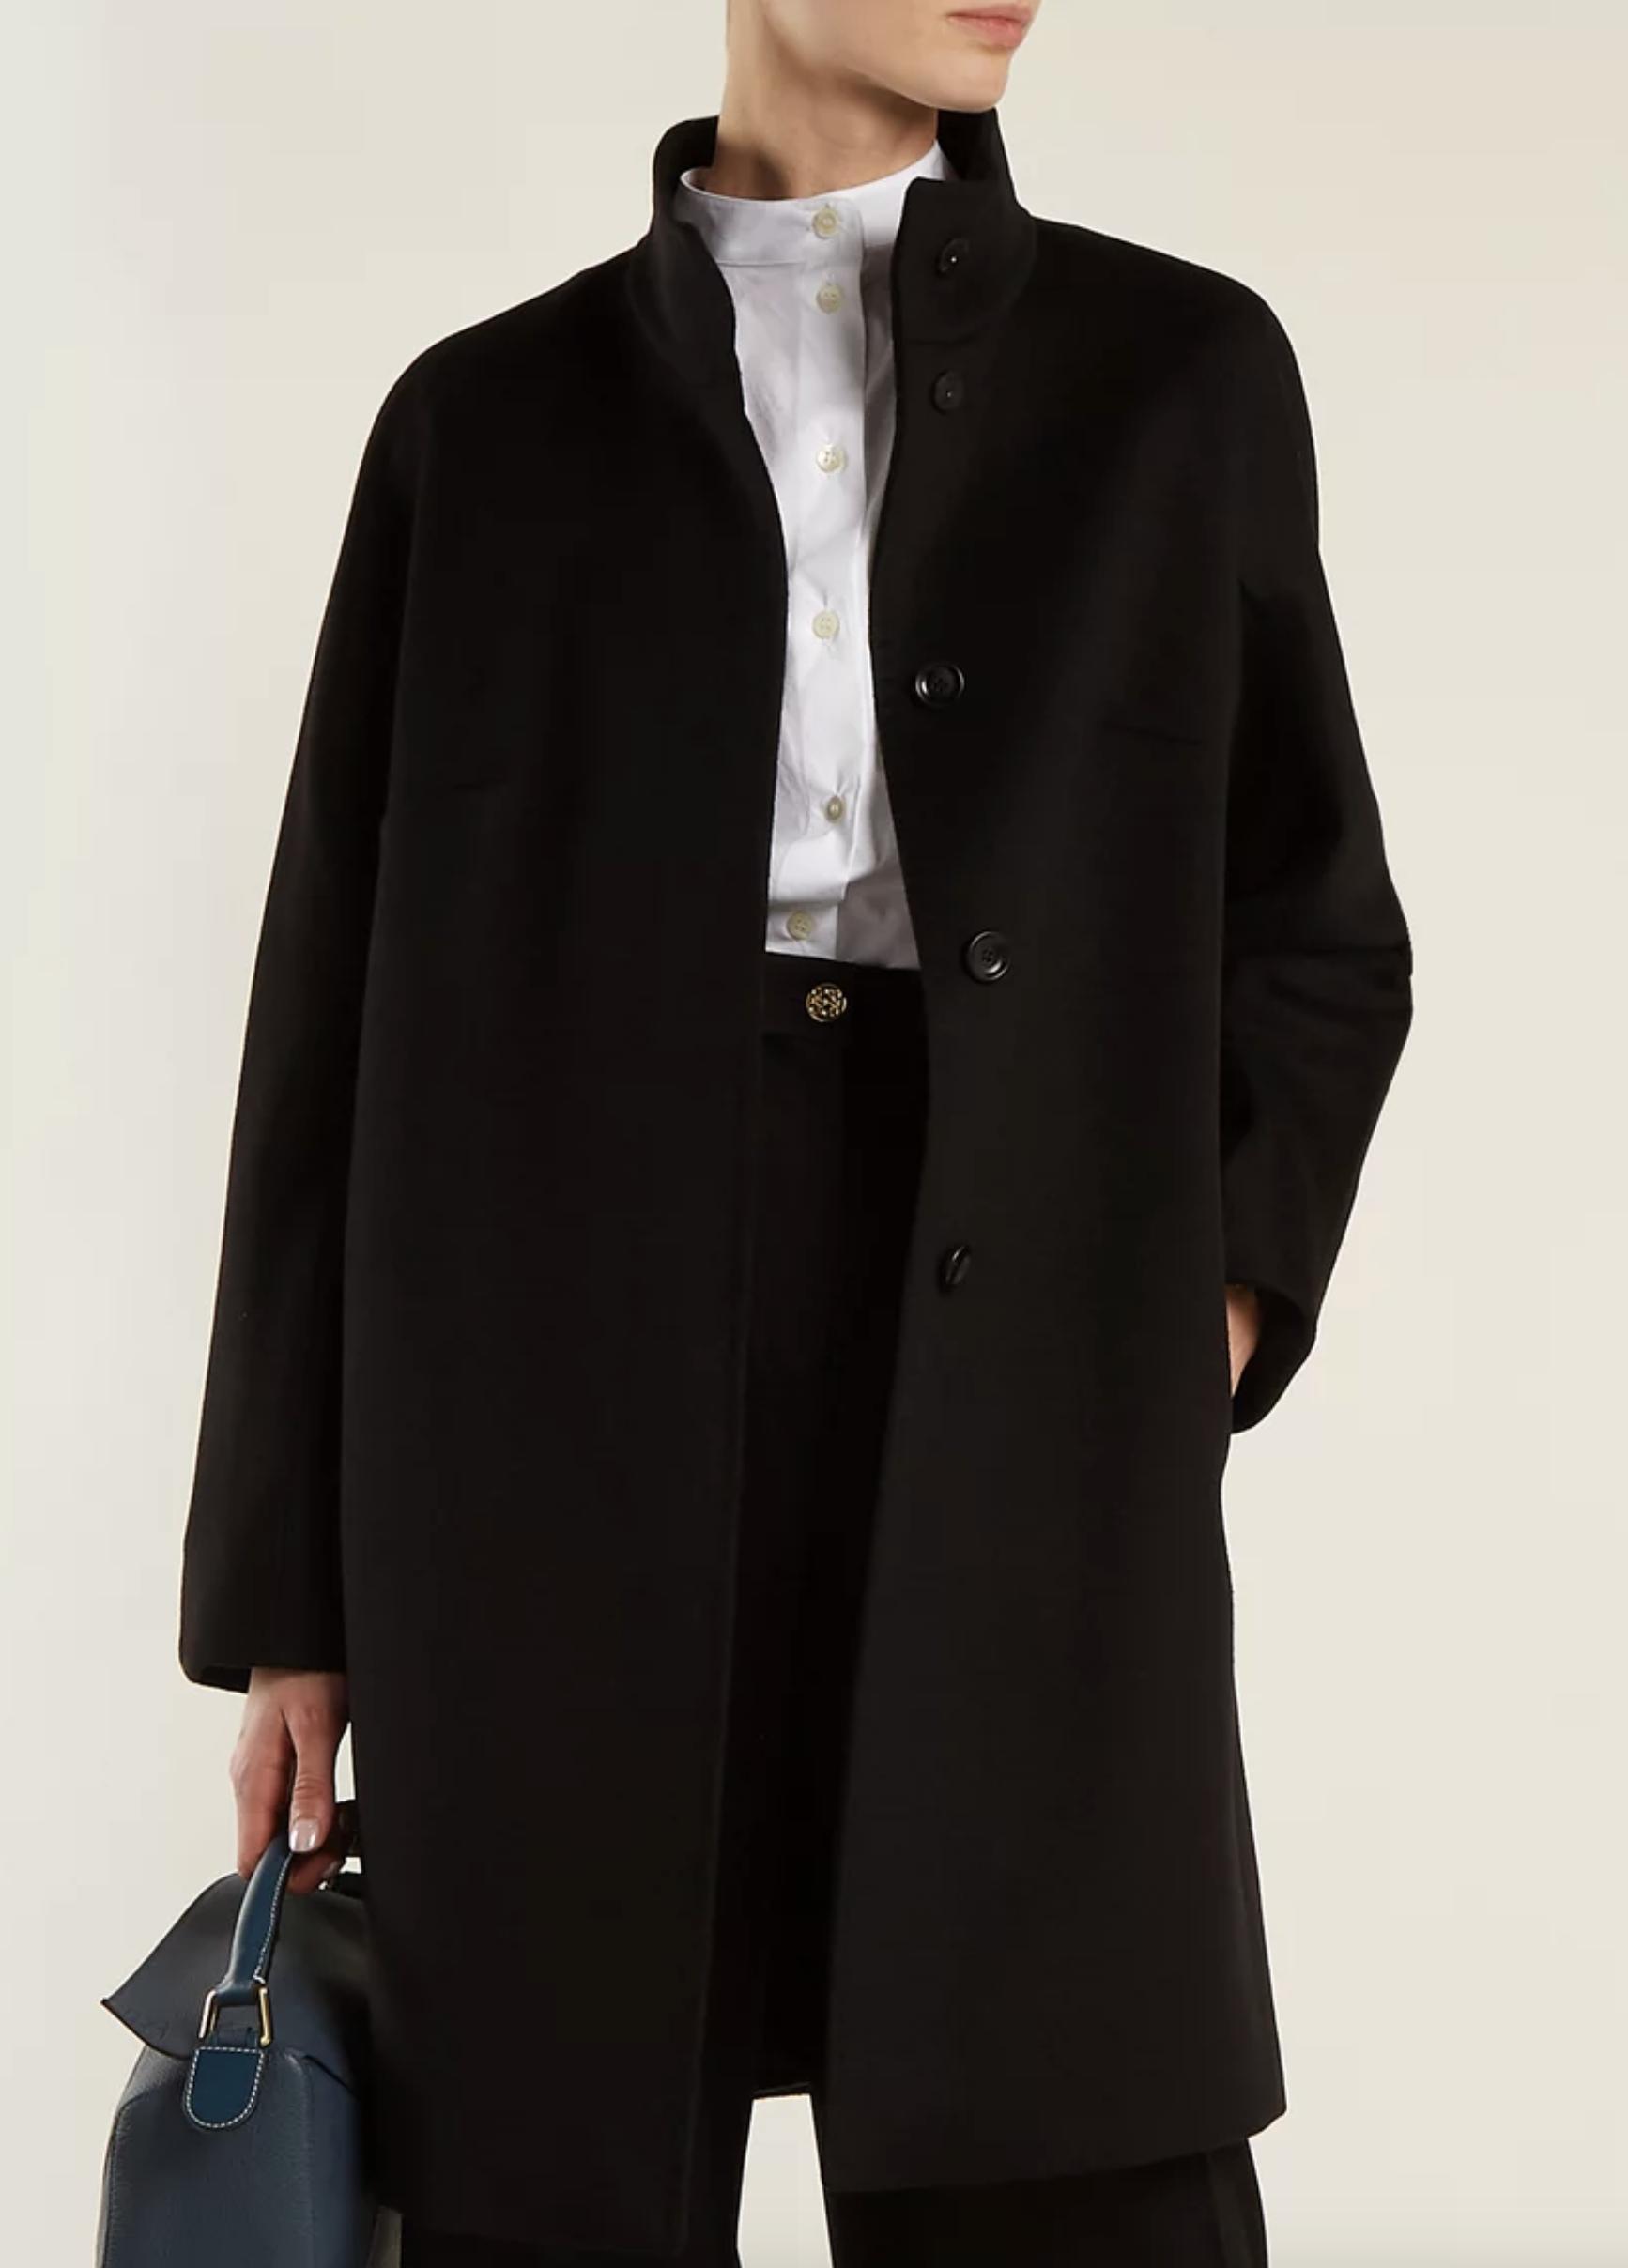 Lizzie Edwards Personal Stylist London Max_Mara_Melina_Coat.png